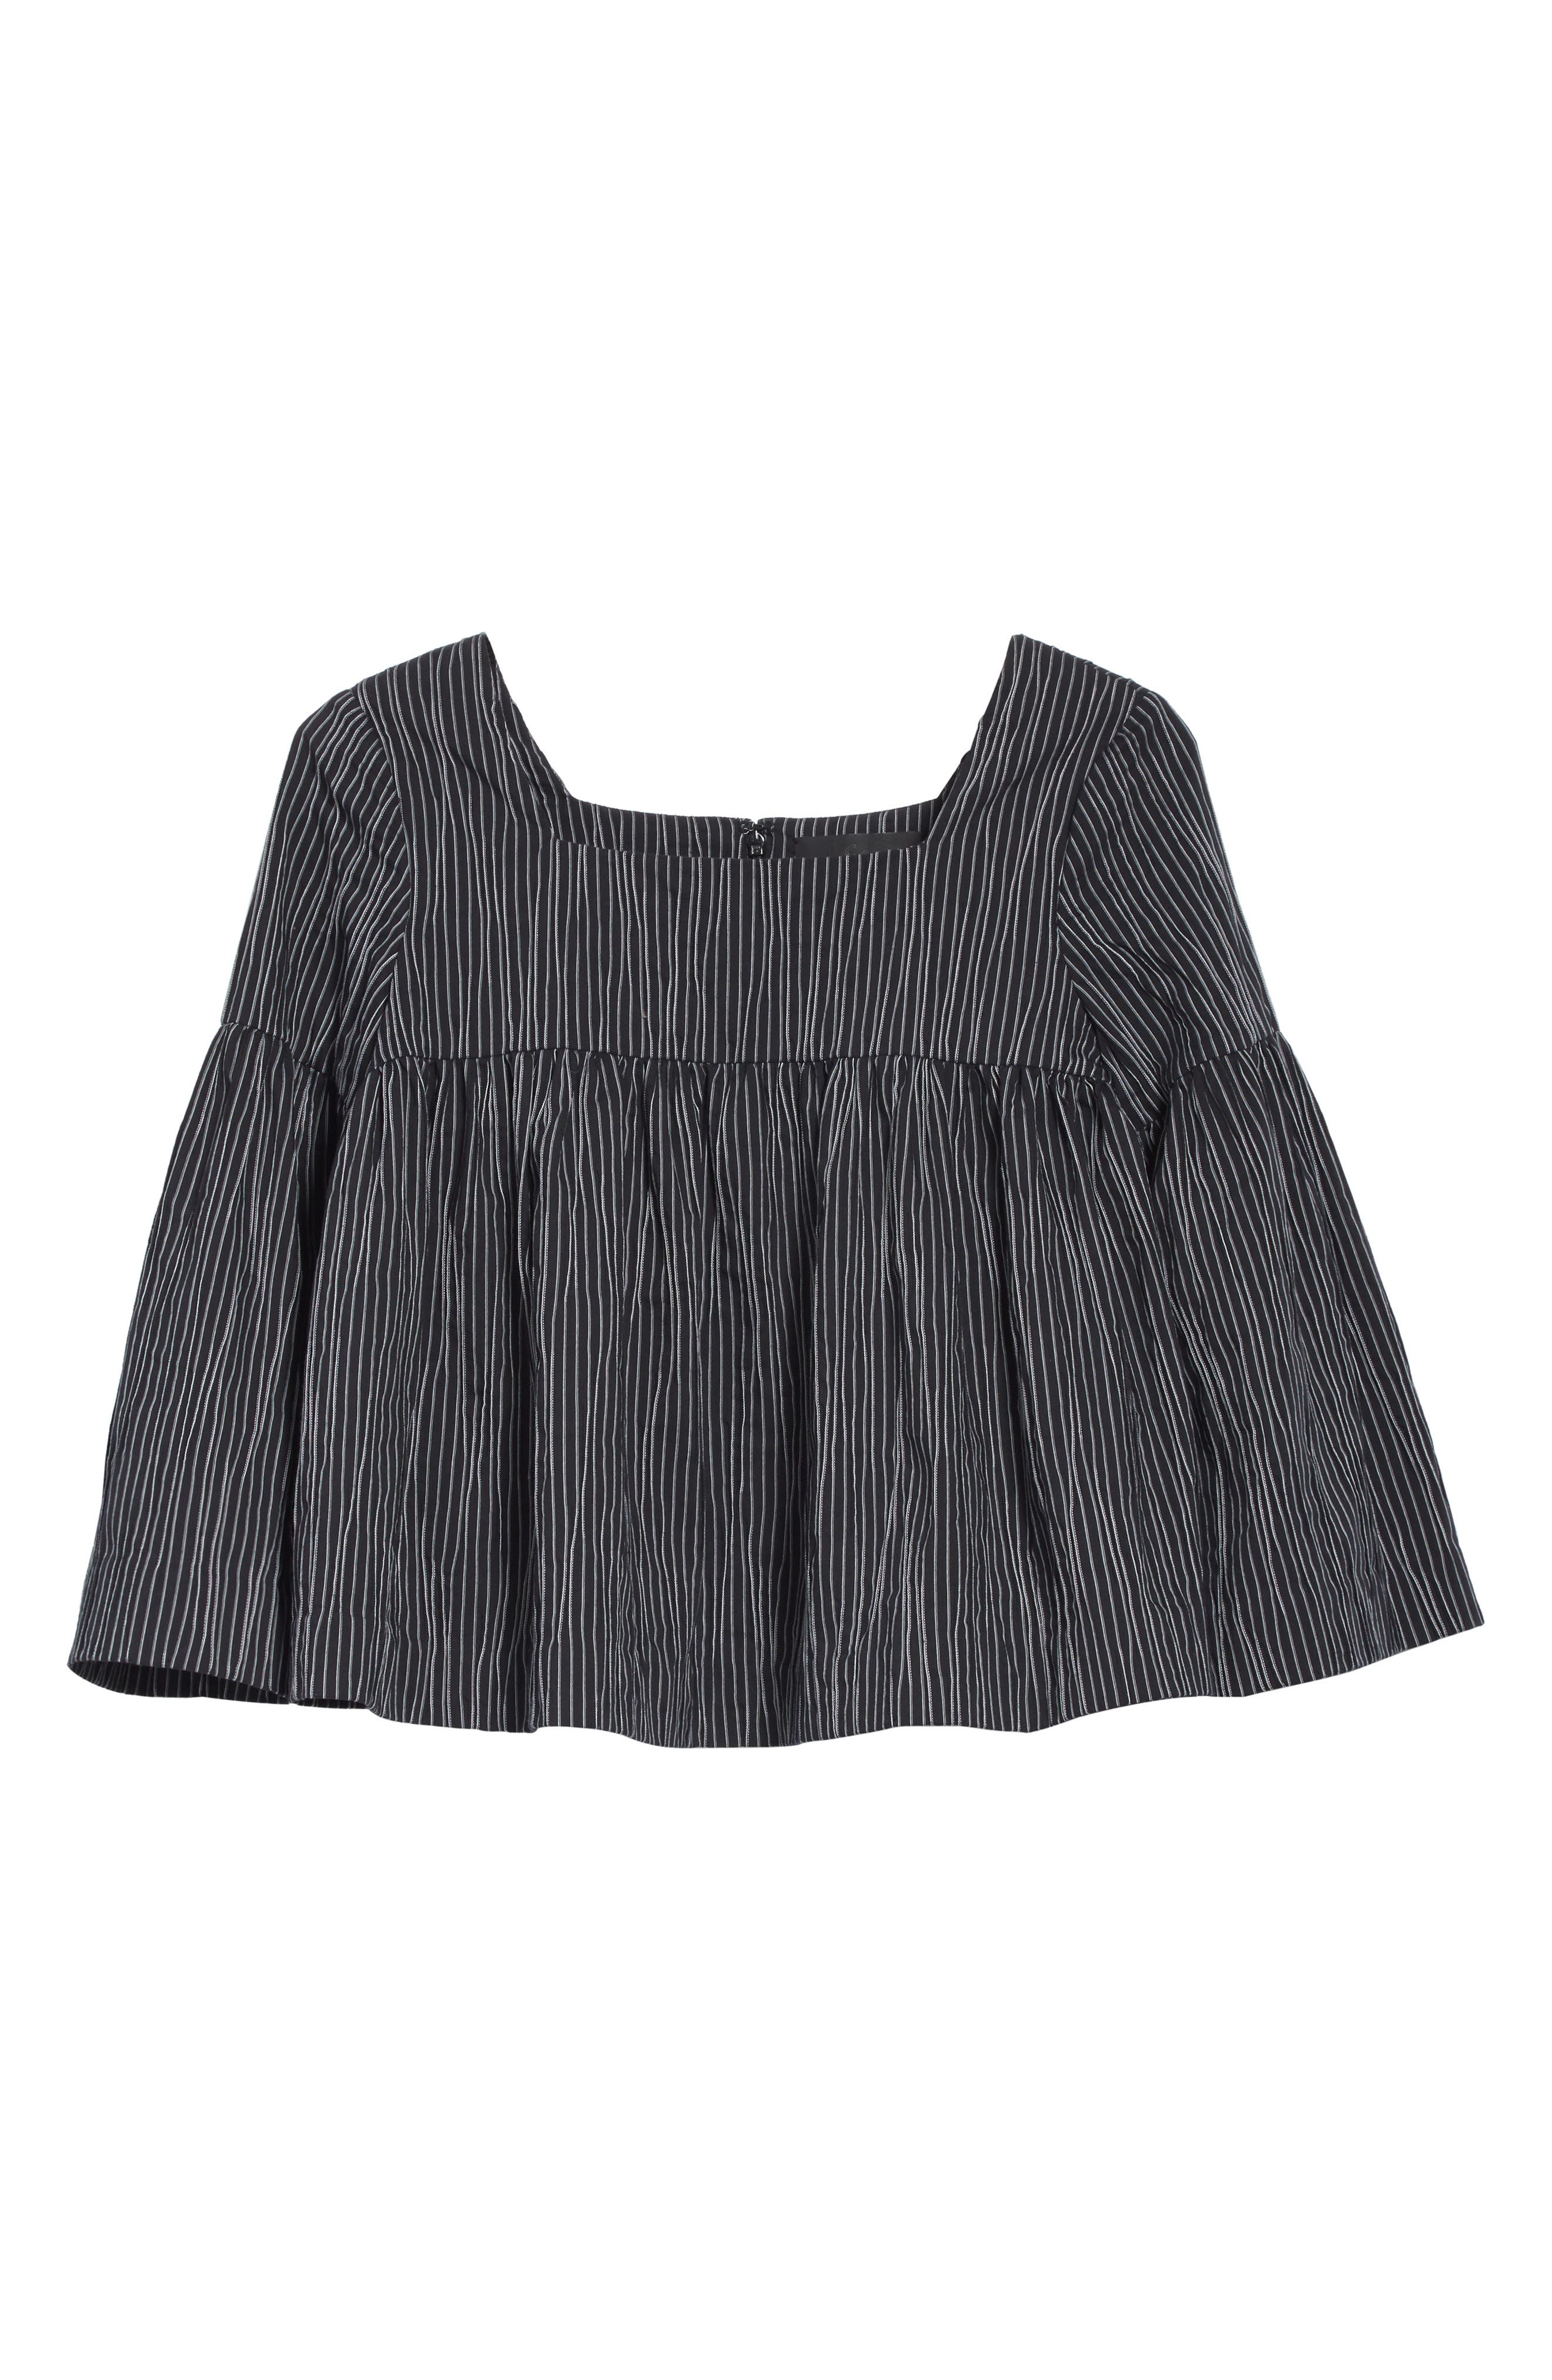 Stripe Crinkle Cotton Blend Swing Top,                             Alternate thumbnail 6, color,                             Black/ White Stripe